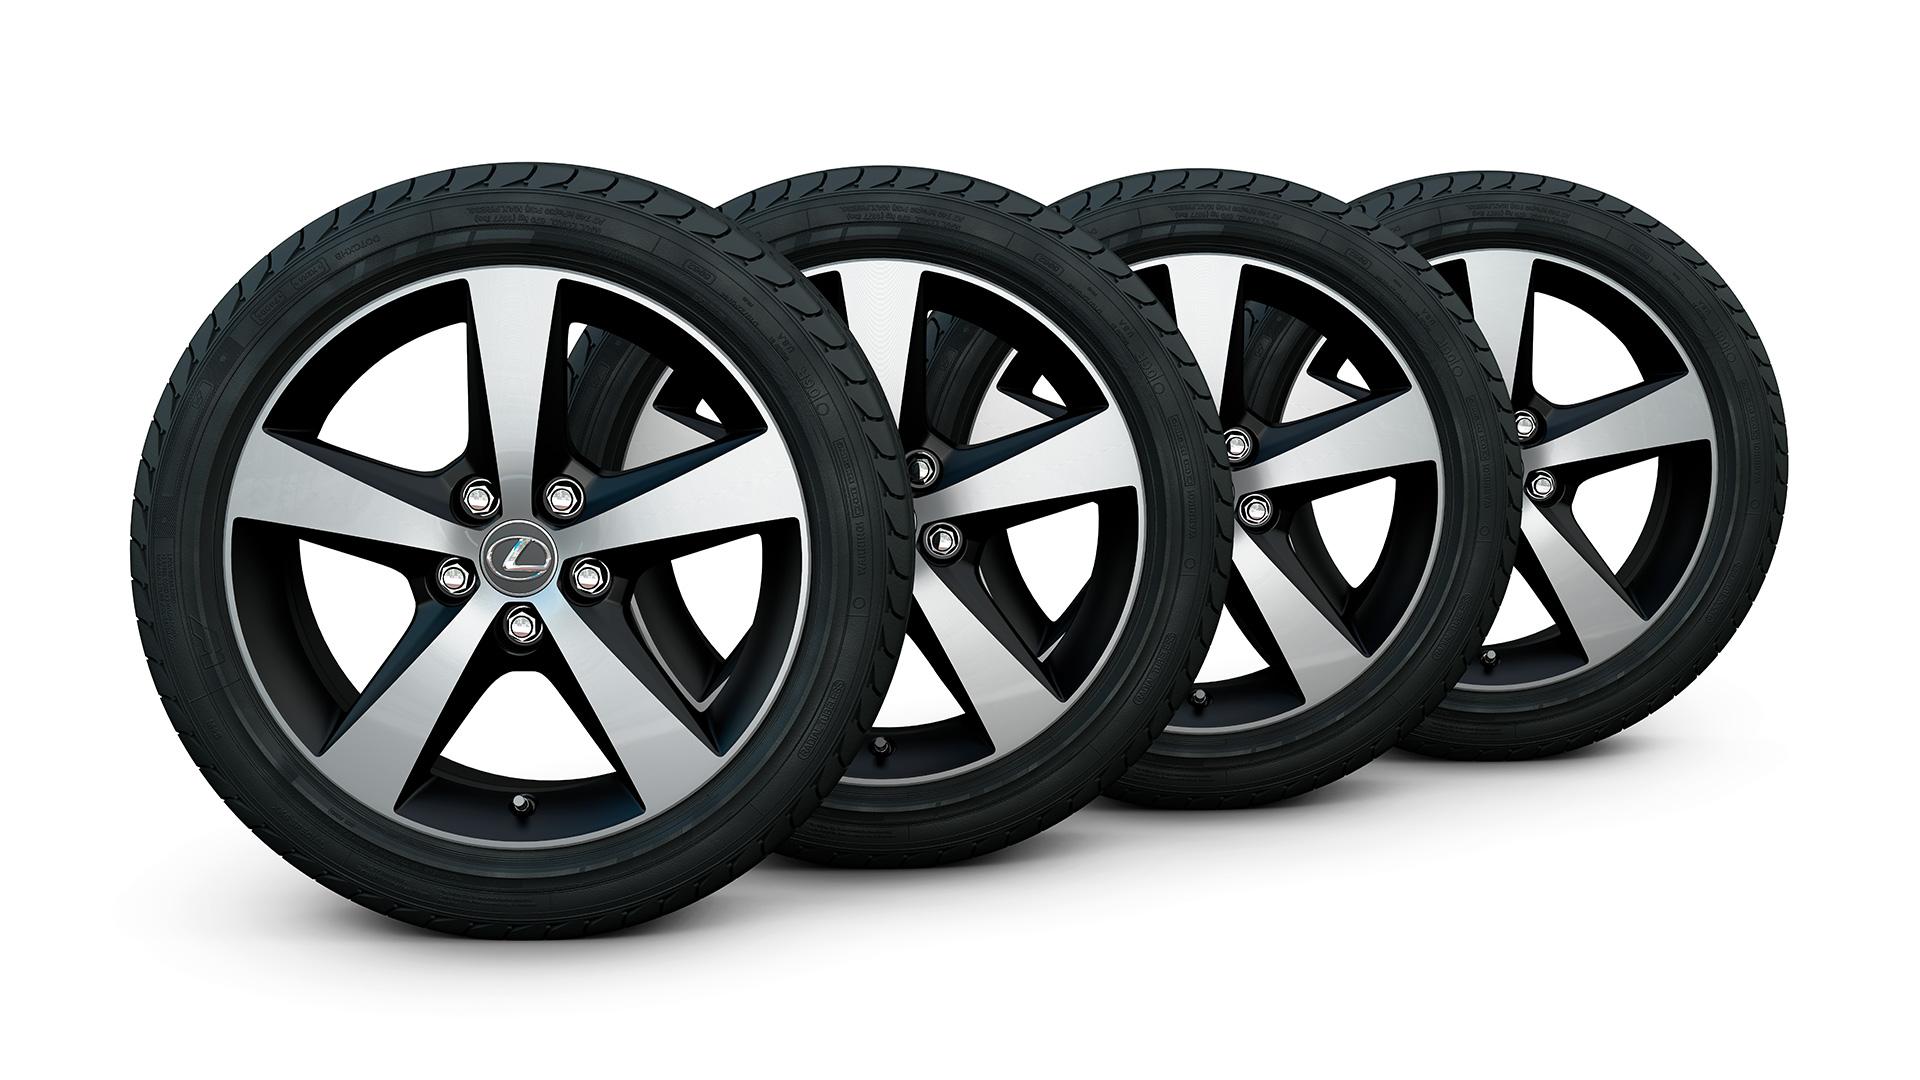 2017 lexus winter accessories gallery 007 wheels